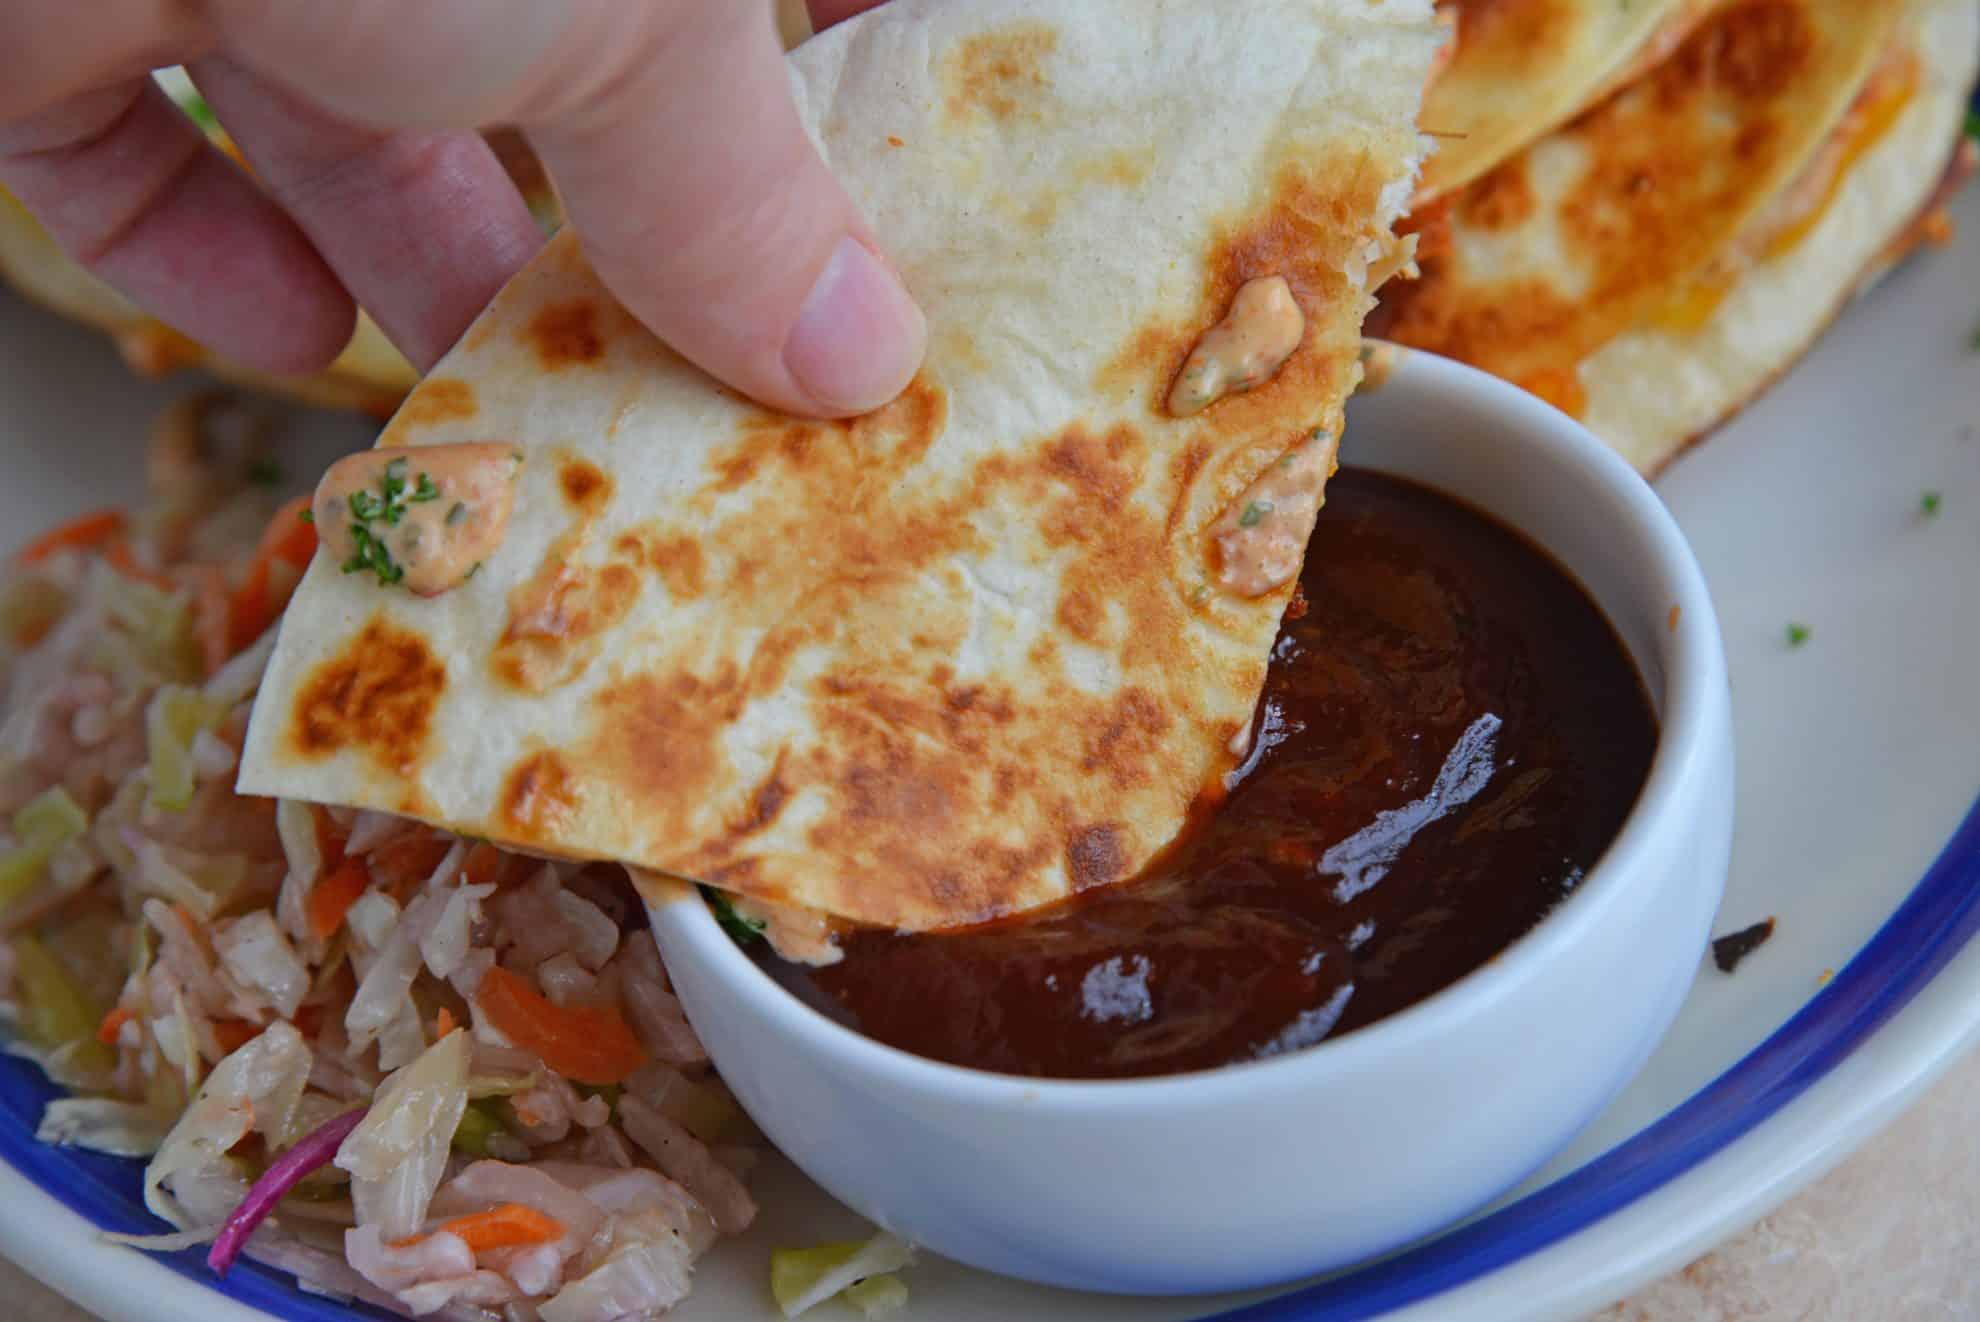 quesadilla dipping into bbq sauce